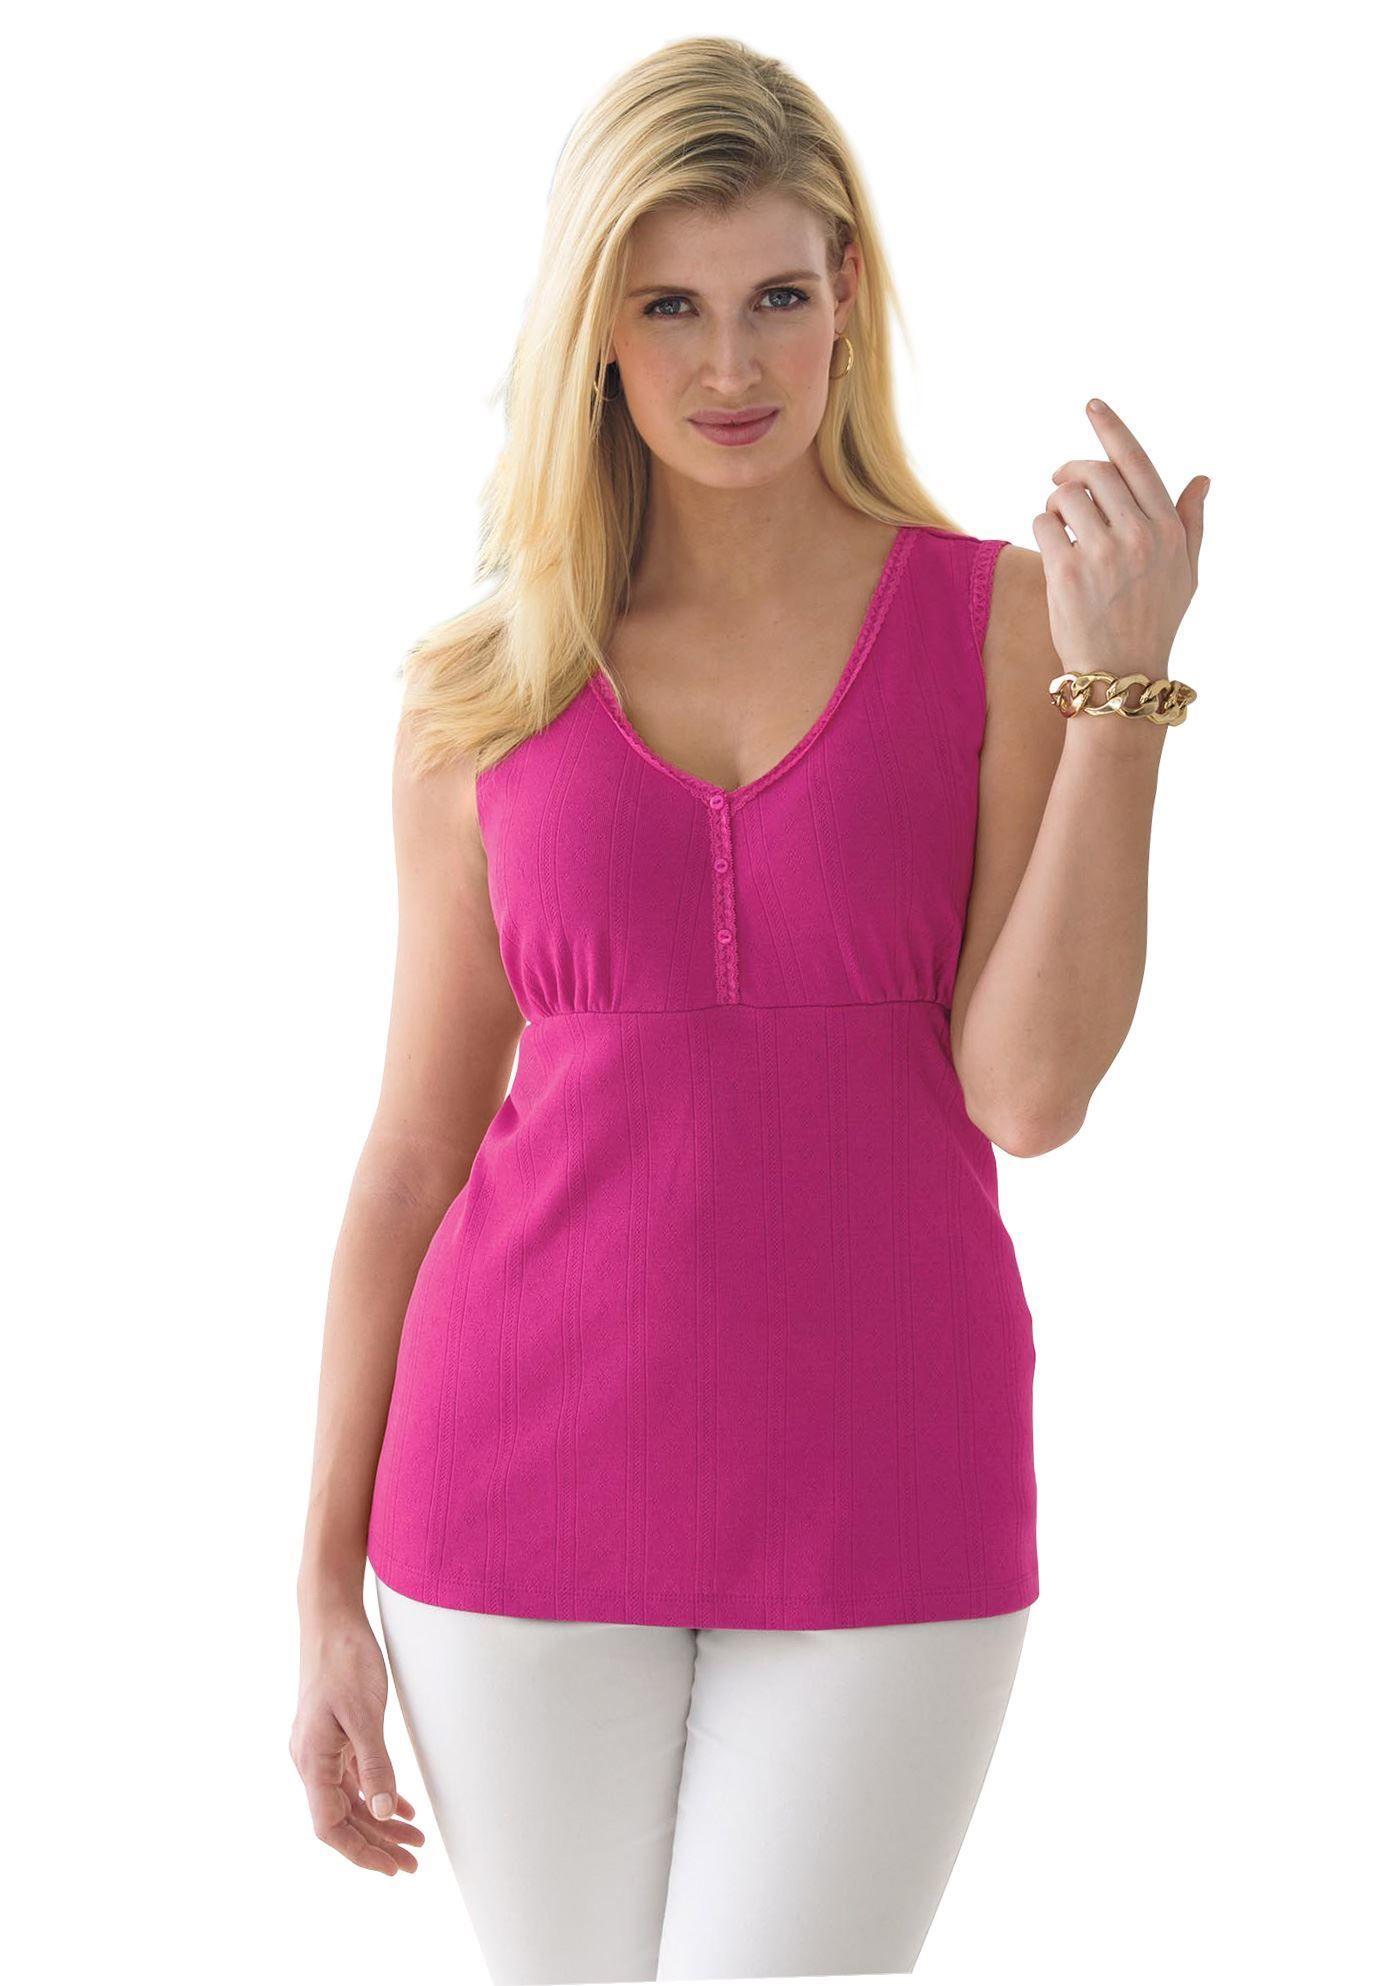 Discount On Jessica London® Lace Trim Tank Top Lace trim